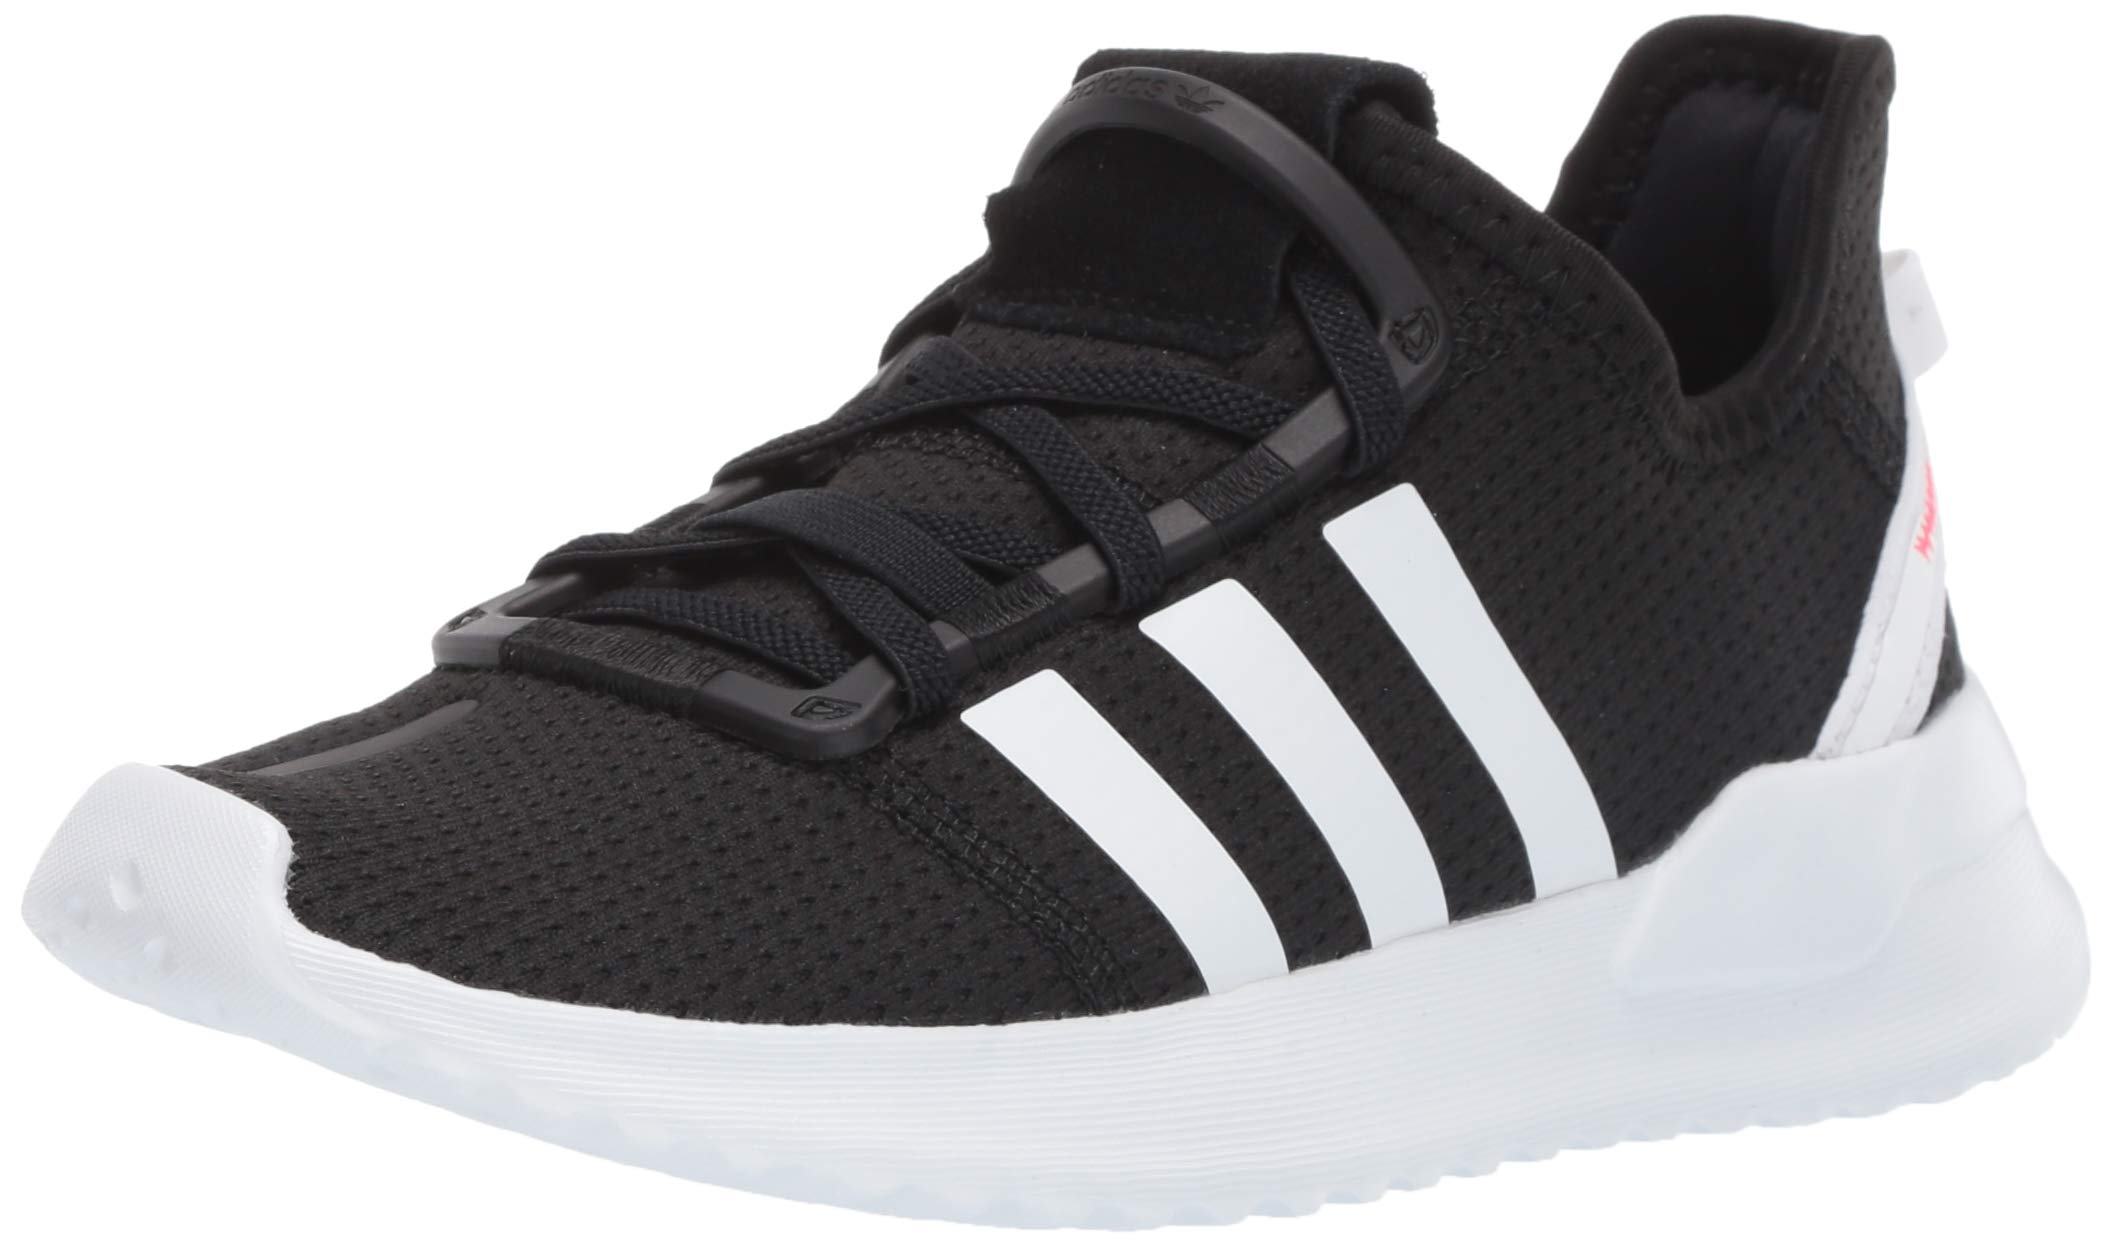 adidas Originals Baby U_Path Running Shoe Black/White/Shock red 5K M US Toddler by adidas Originals (Image #1)